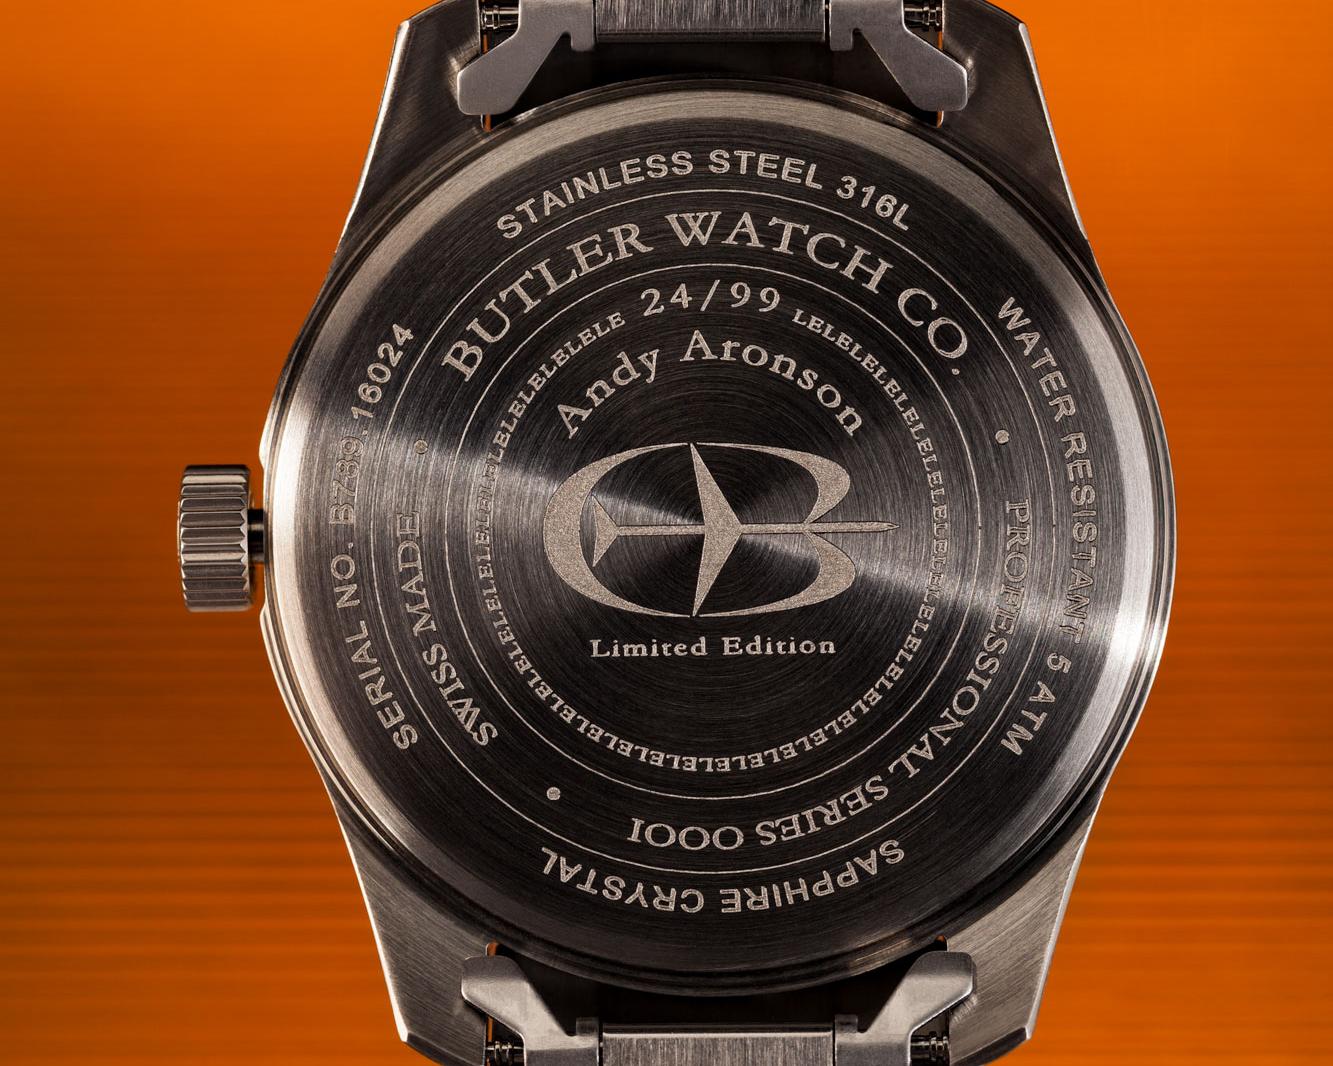 Pro Oooi Butler Watch Company